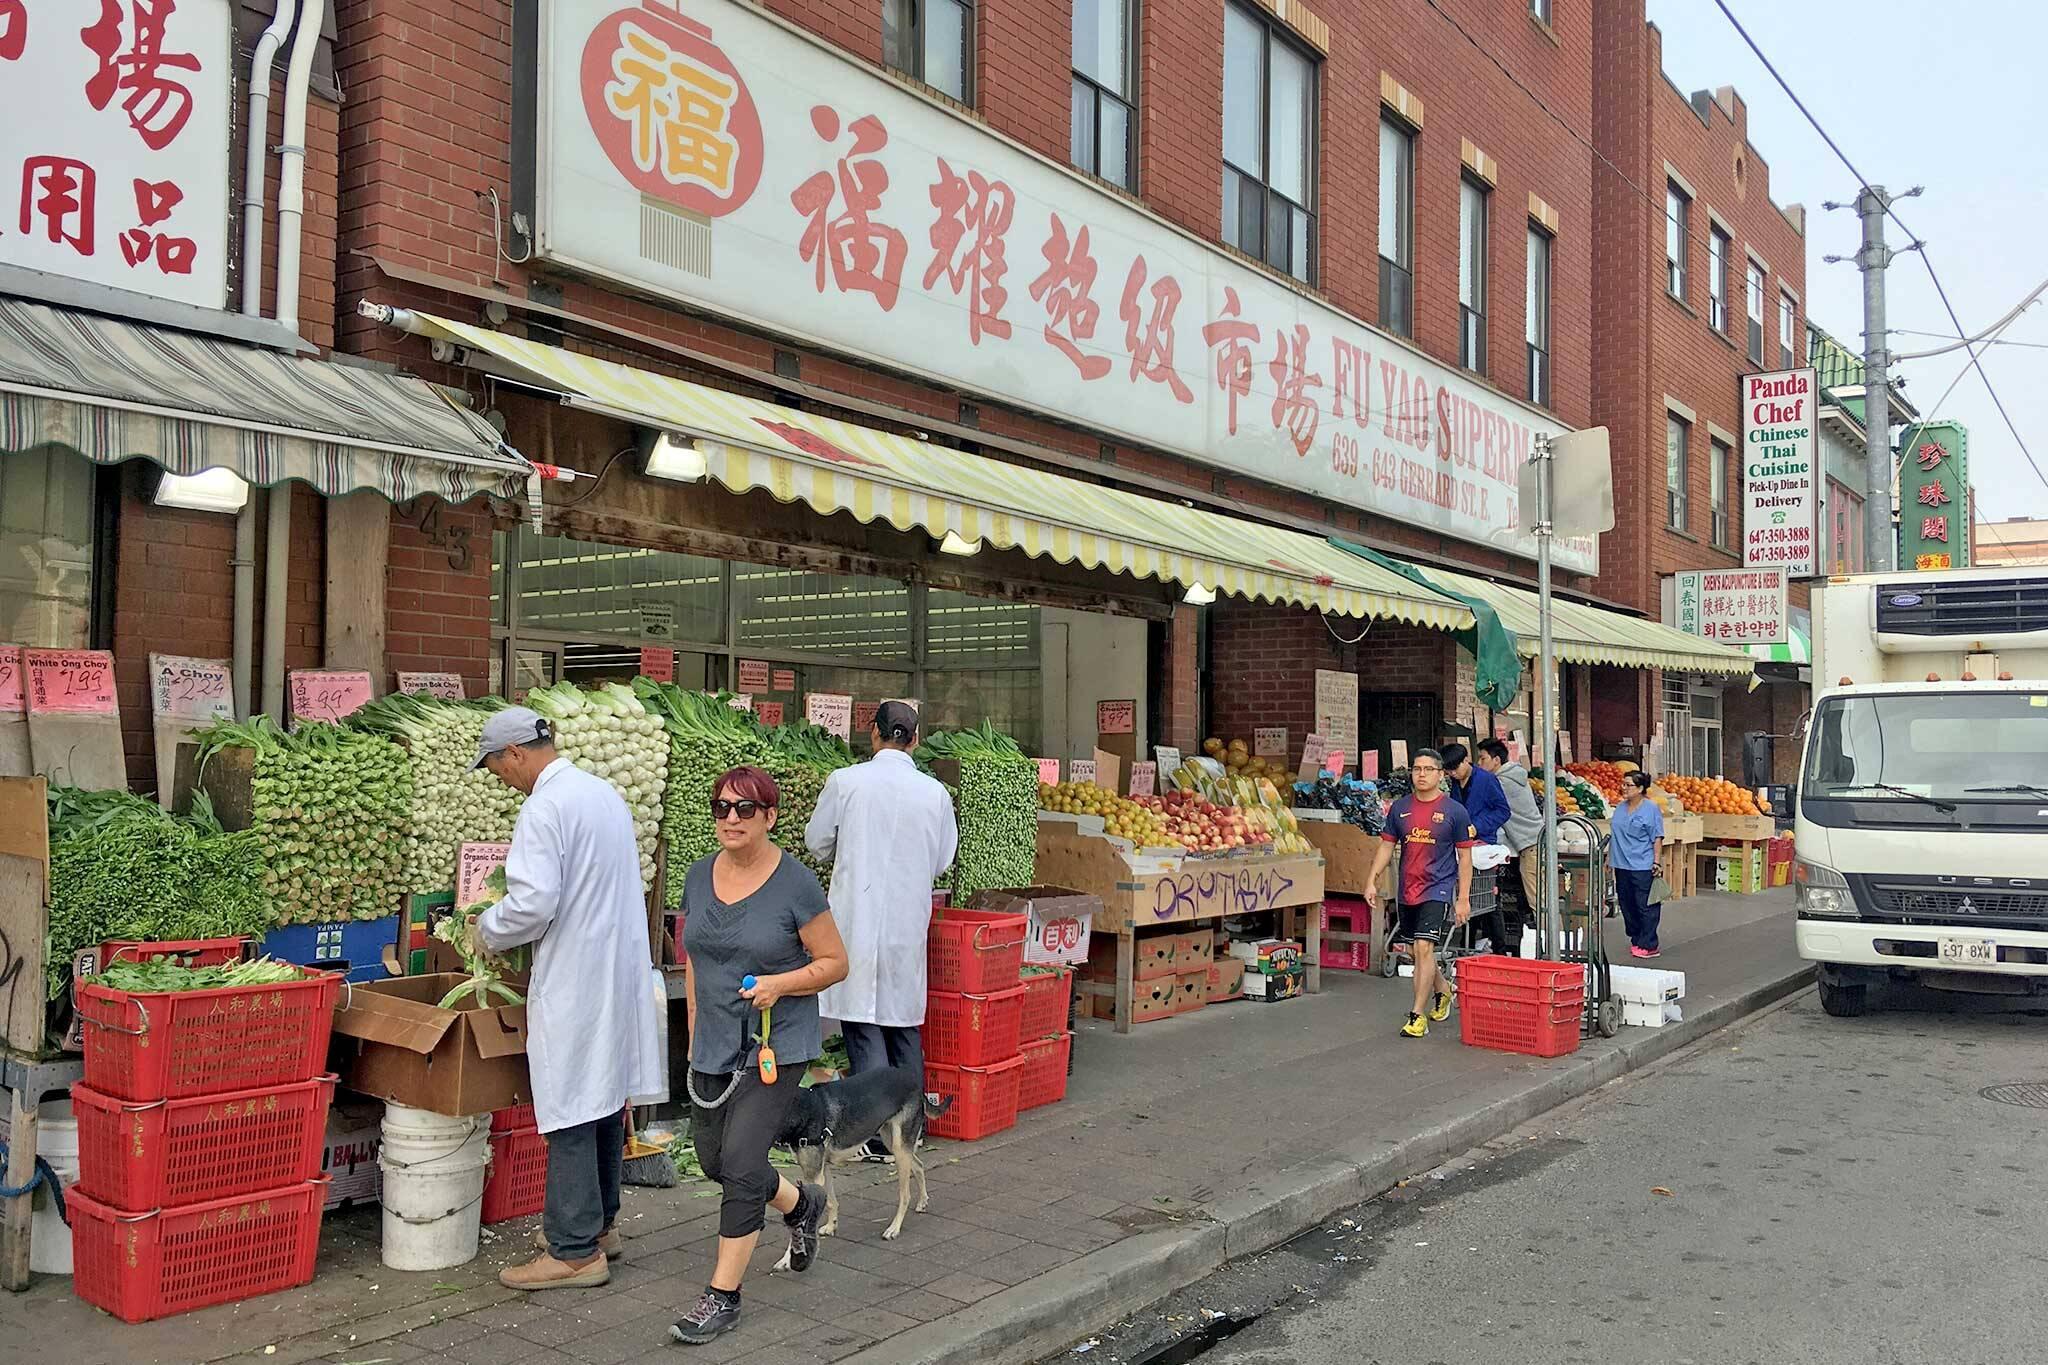 east chinatown toronto